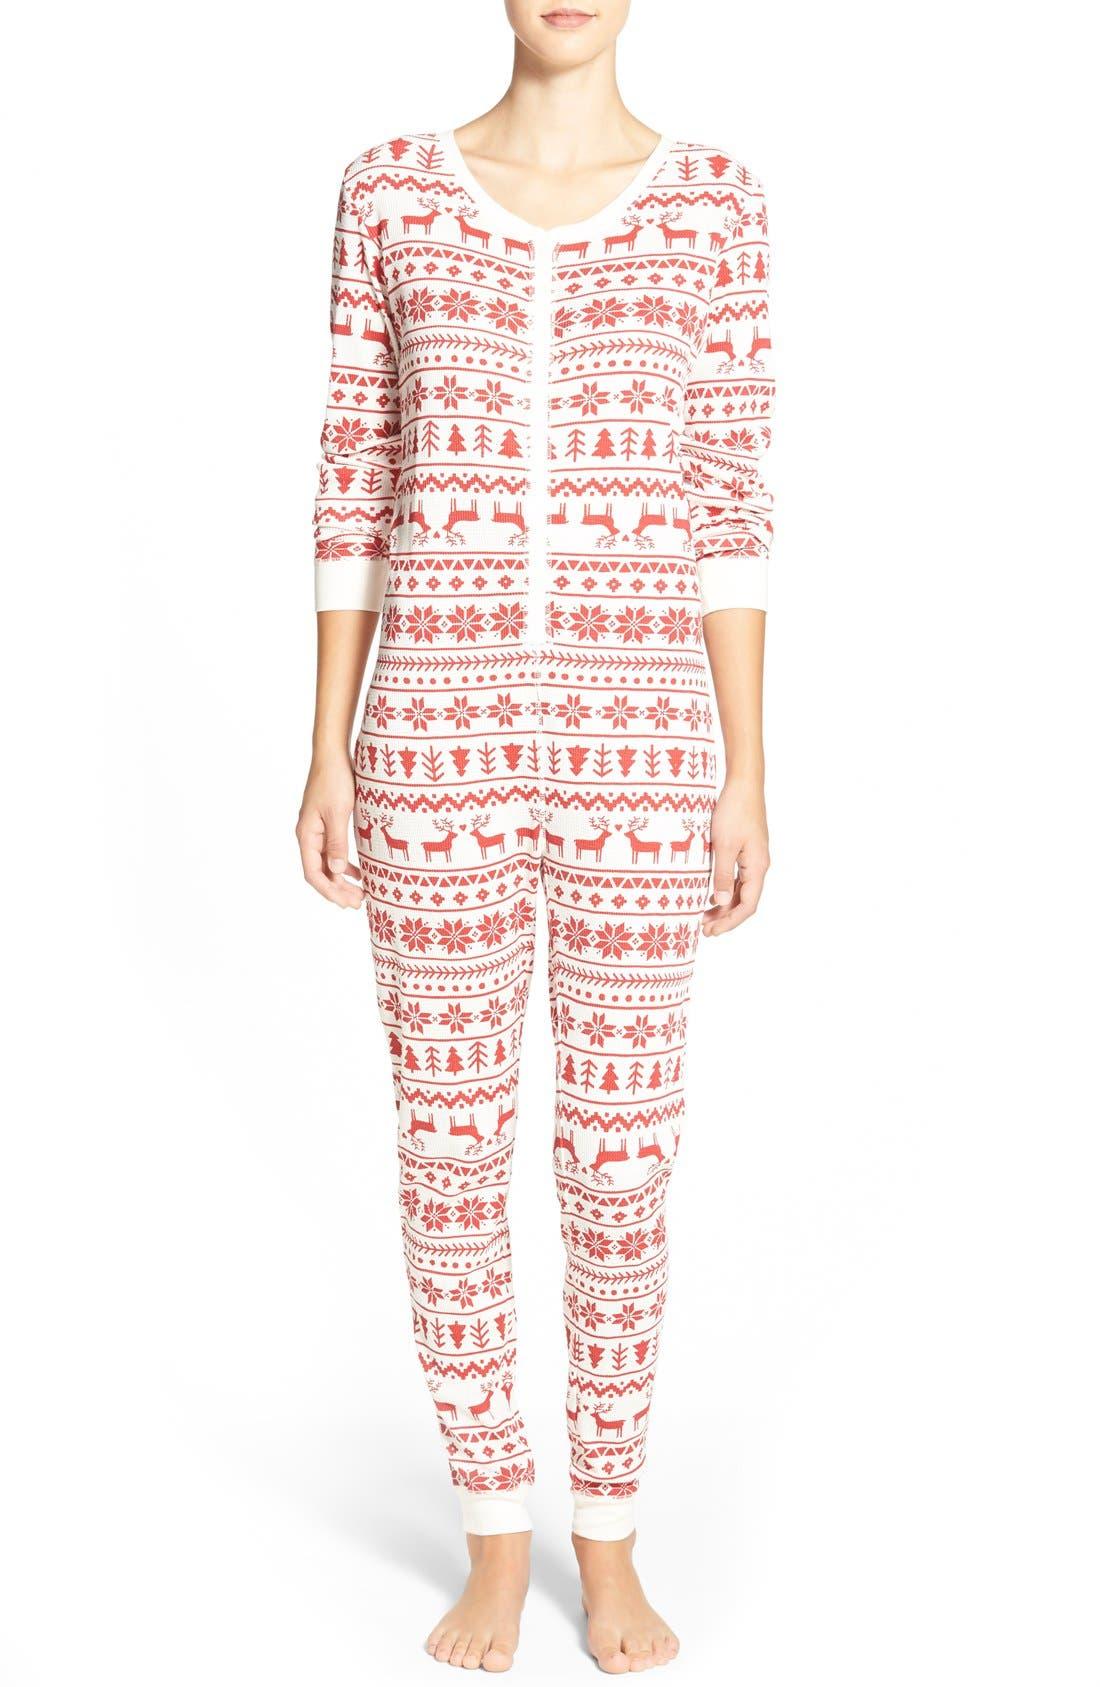 Holiday Thermal One-Piece Pajamas,                             Main thumbnail 1, color,                             Red Beauty Fairisle Sketch